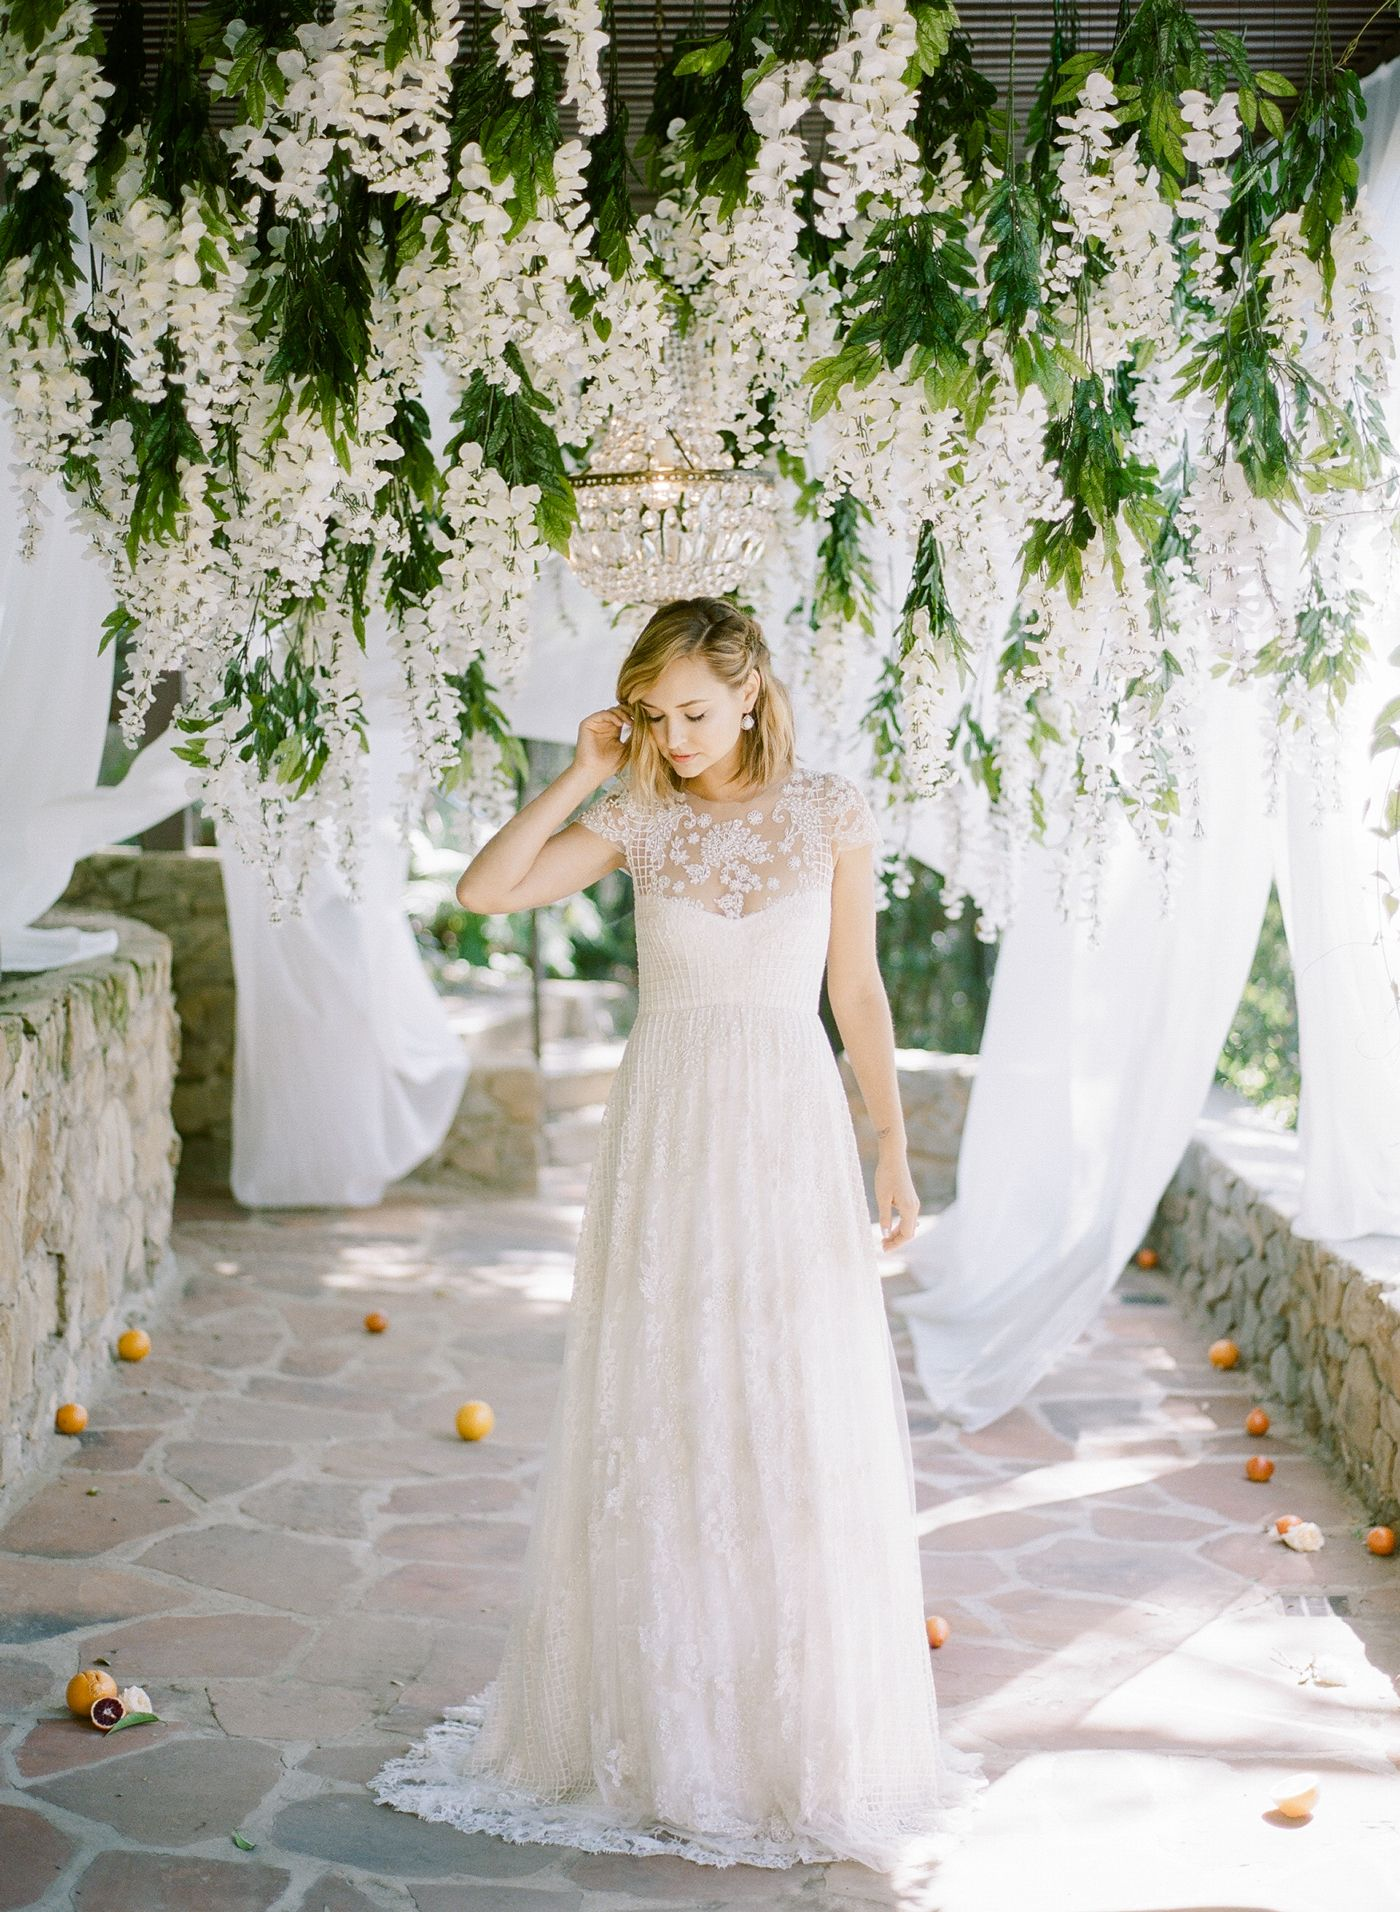 enchanting bride | Late Afternoon Blog | weddings | Pinterest ...